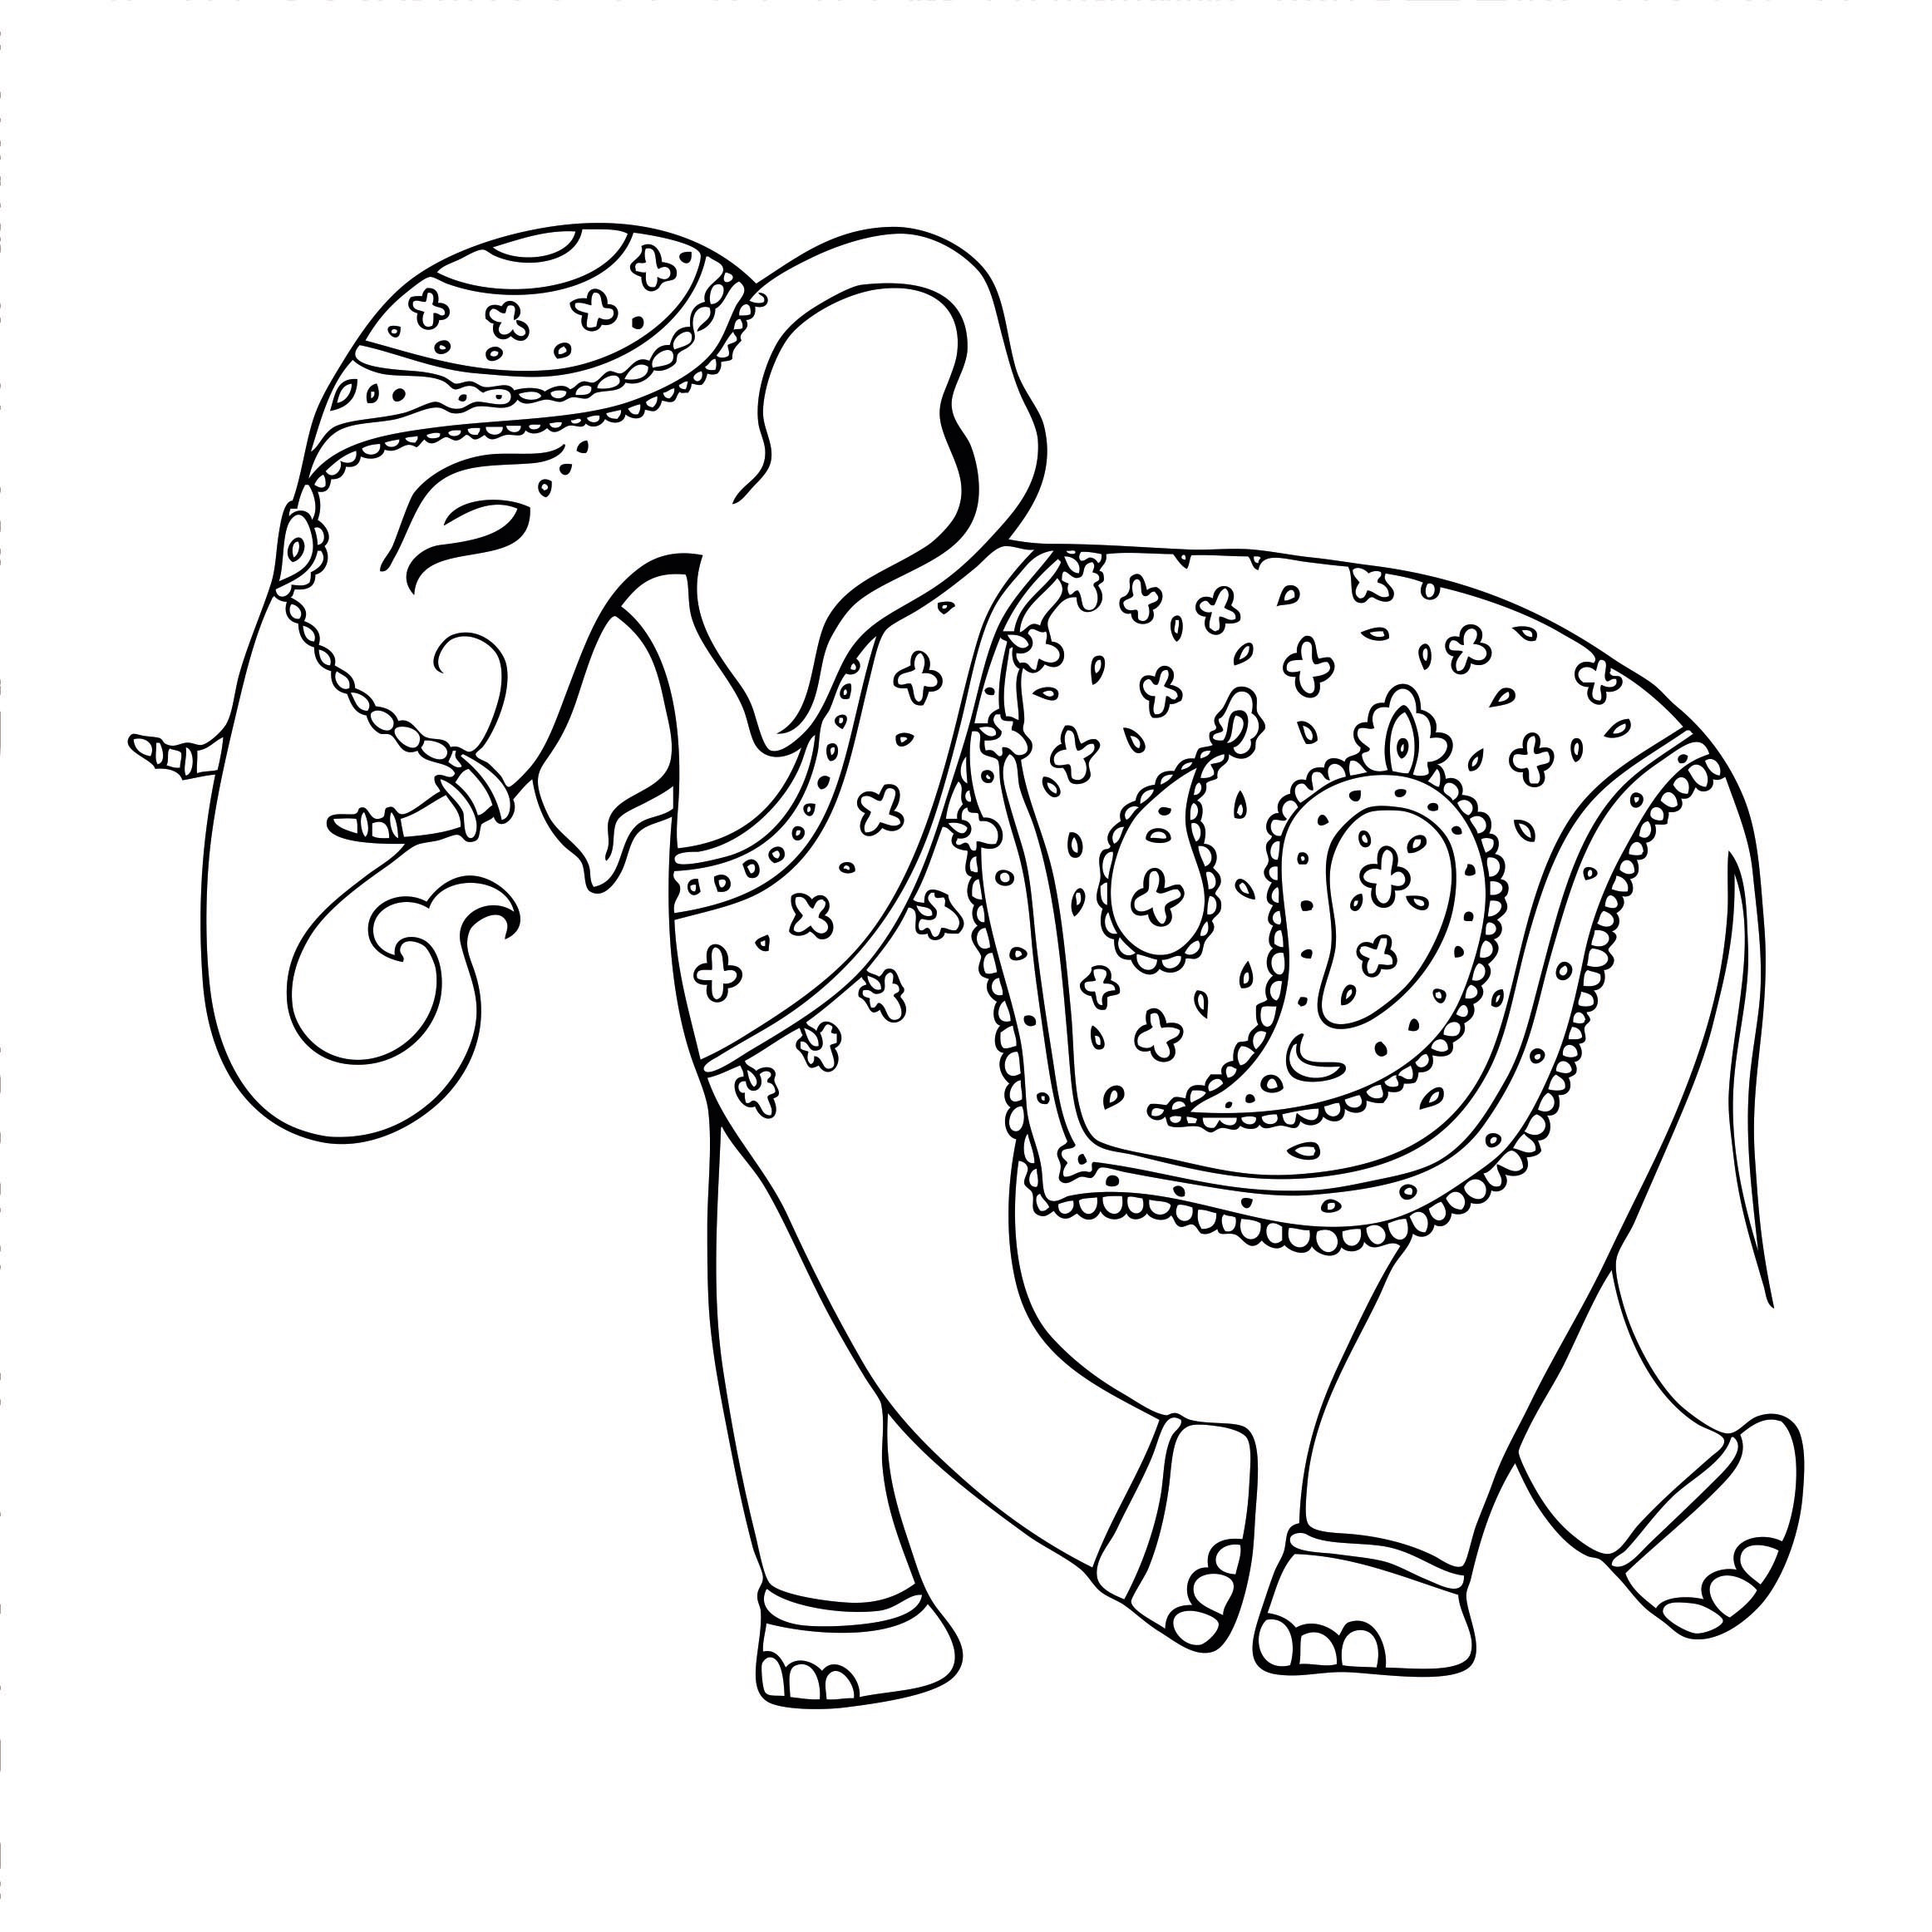 Atemberaubend Elefanten Mandala Malvorlagen Fotos ...